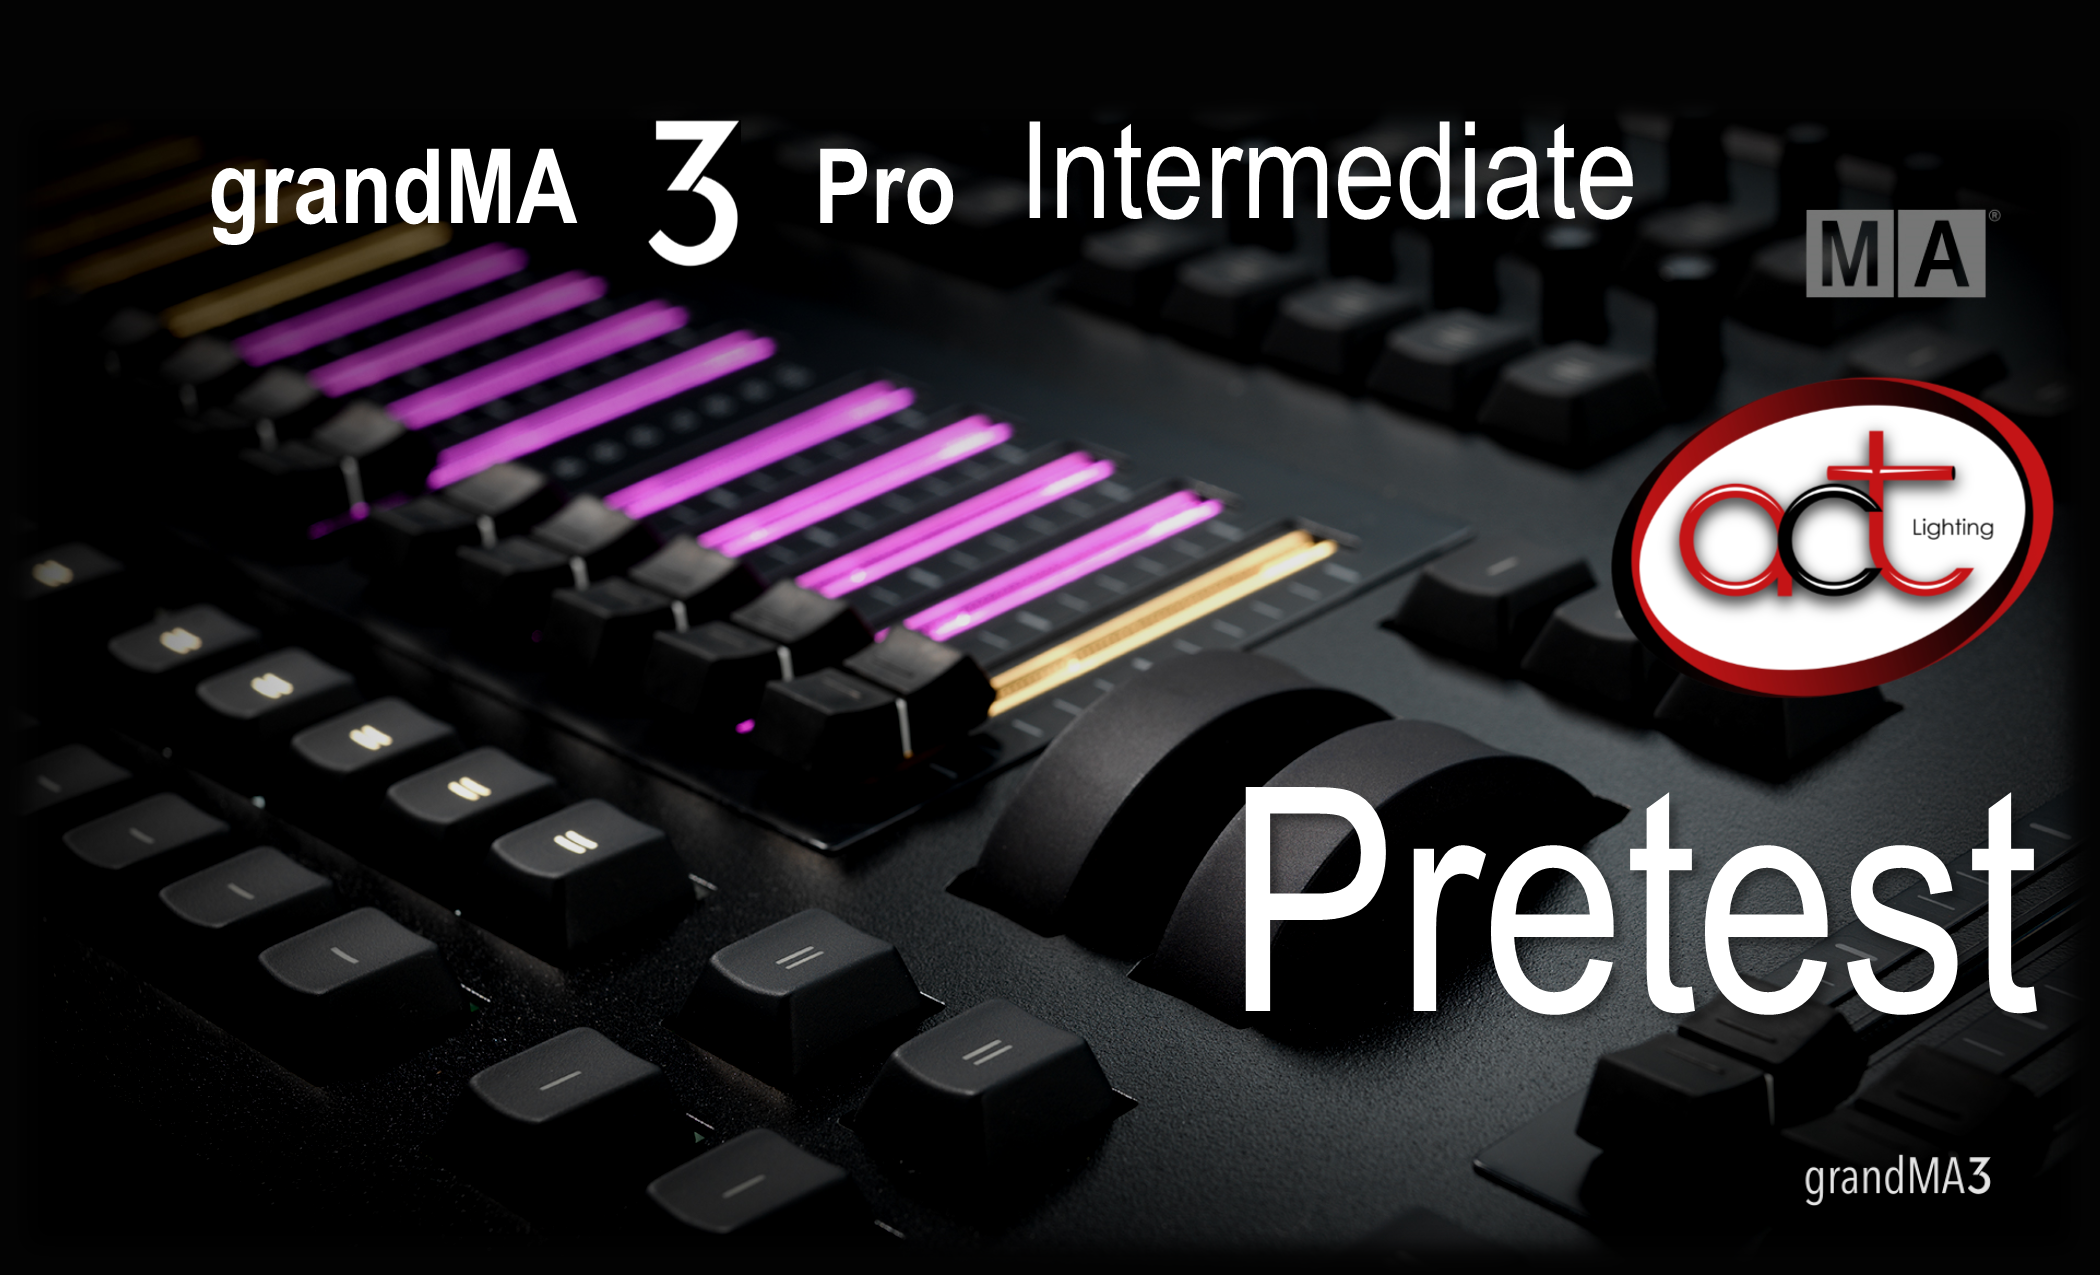 grandMA3 Pro Intermediate Pretest